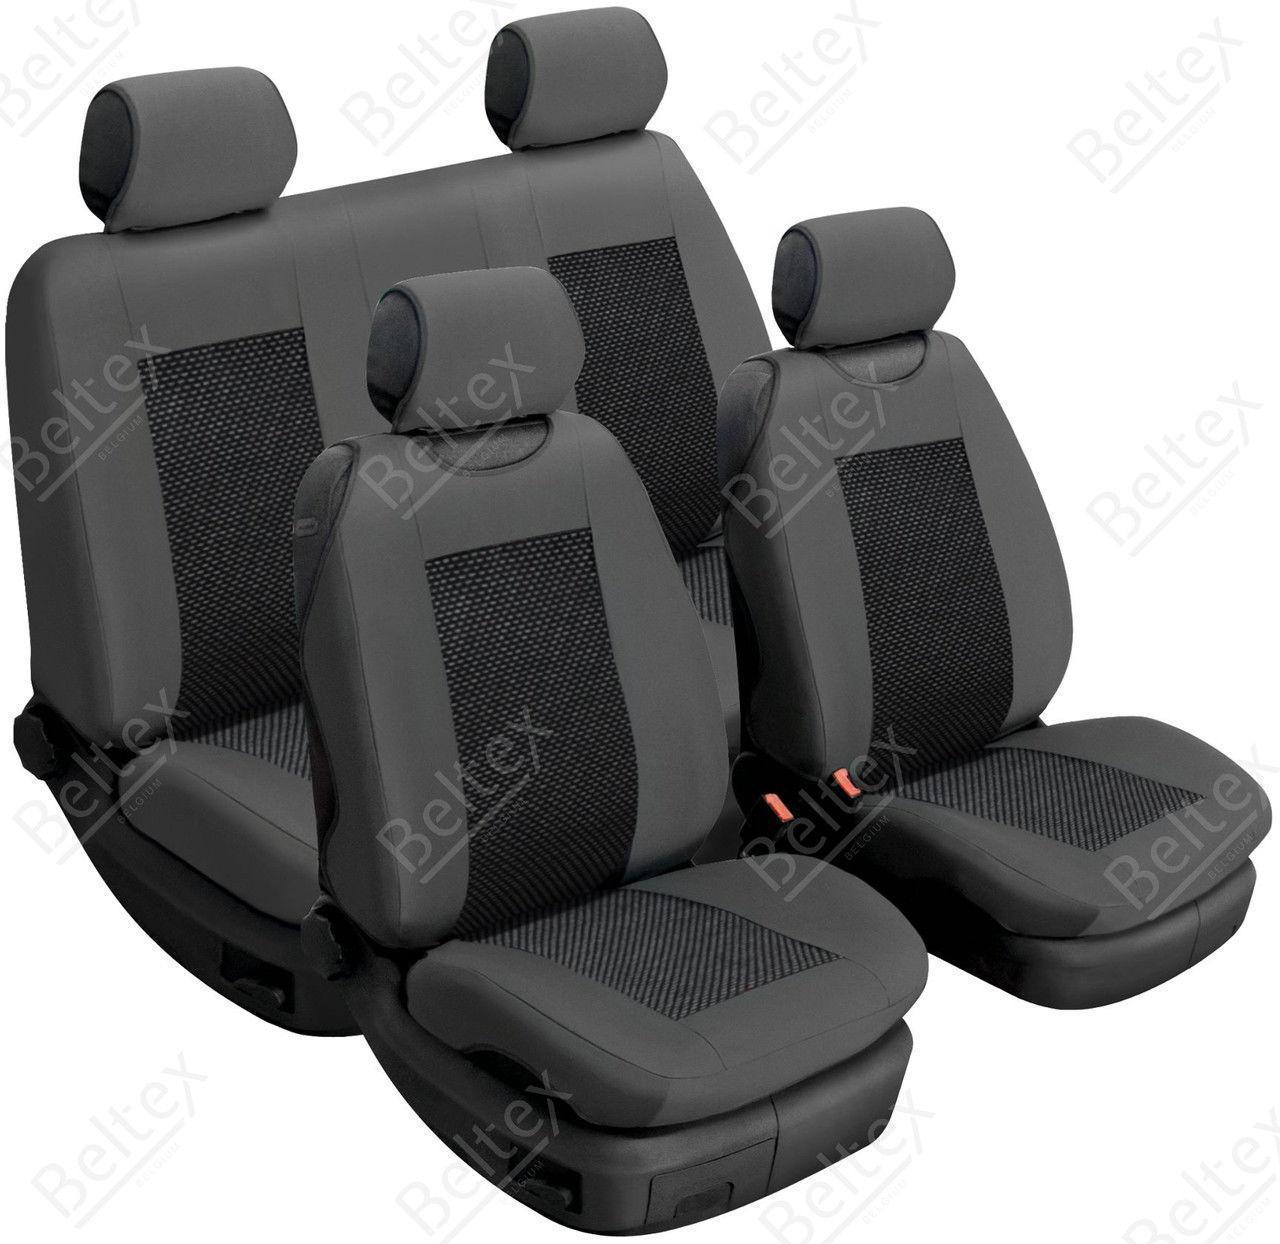 Майки/чехлы на сиденья Сеат Ибица 4 спорт (Seat Ibiza IV sport)